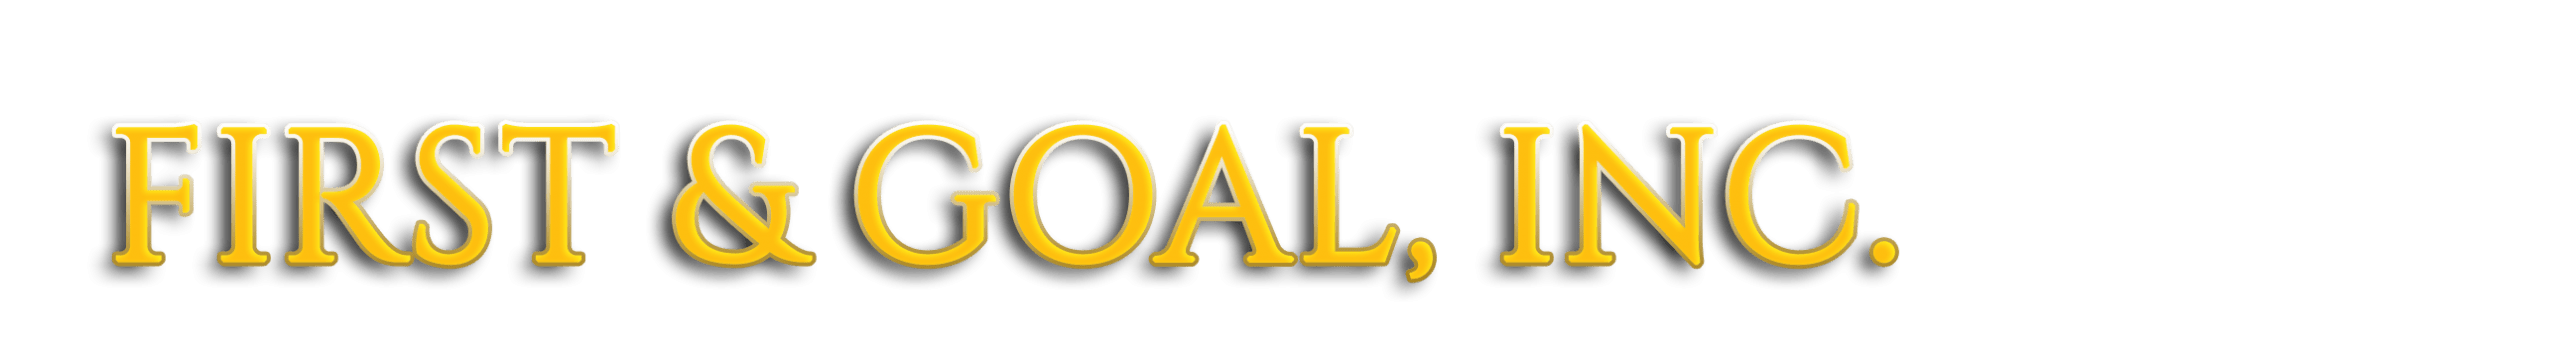 First & Goal, Inc.